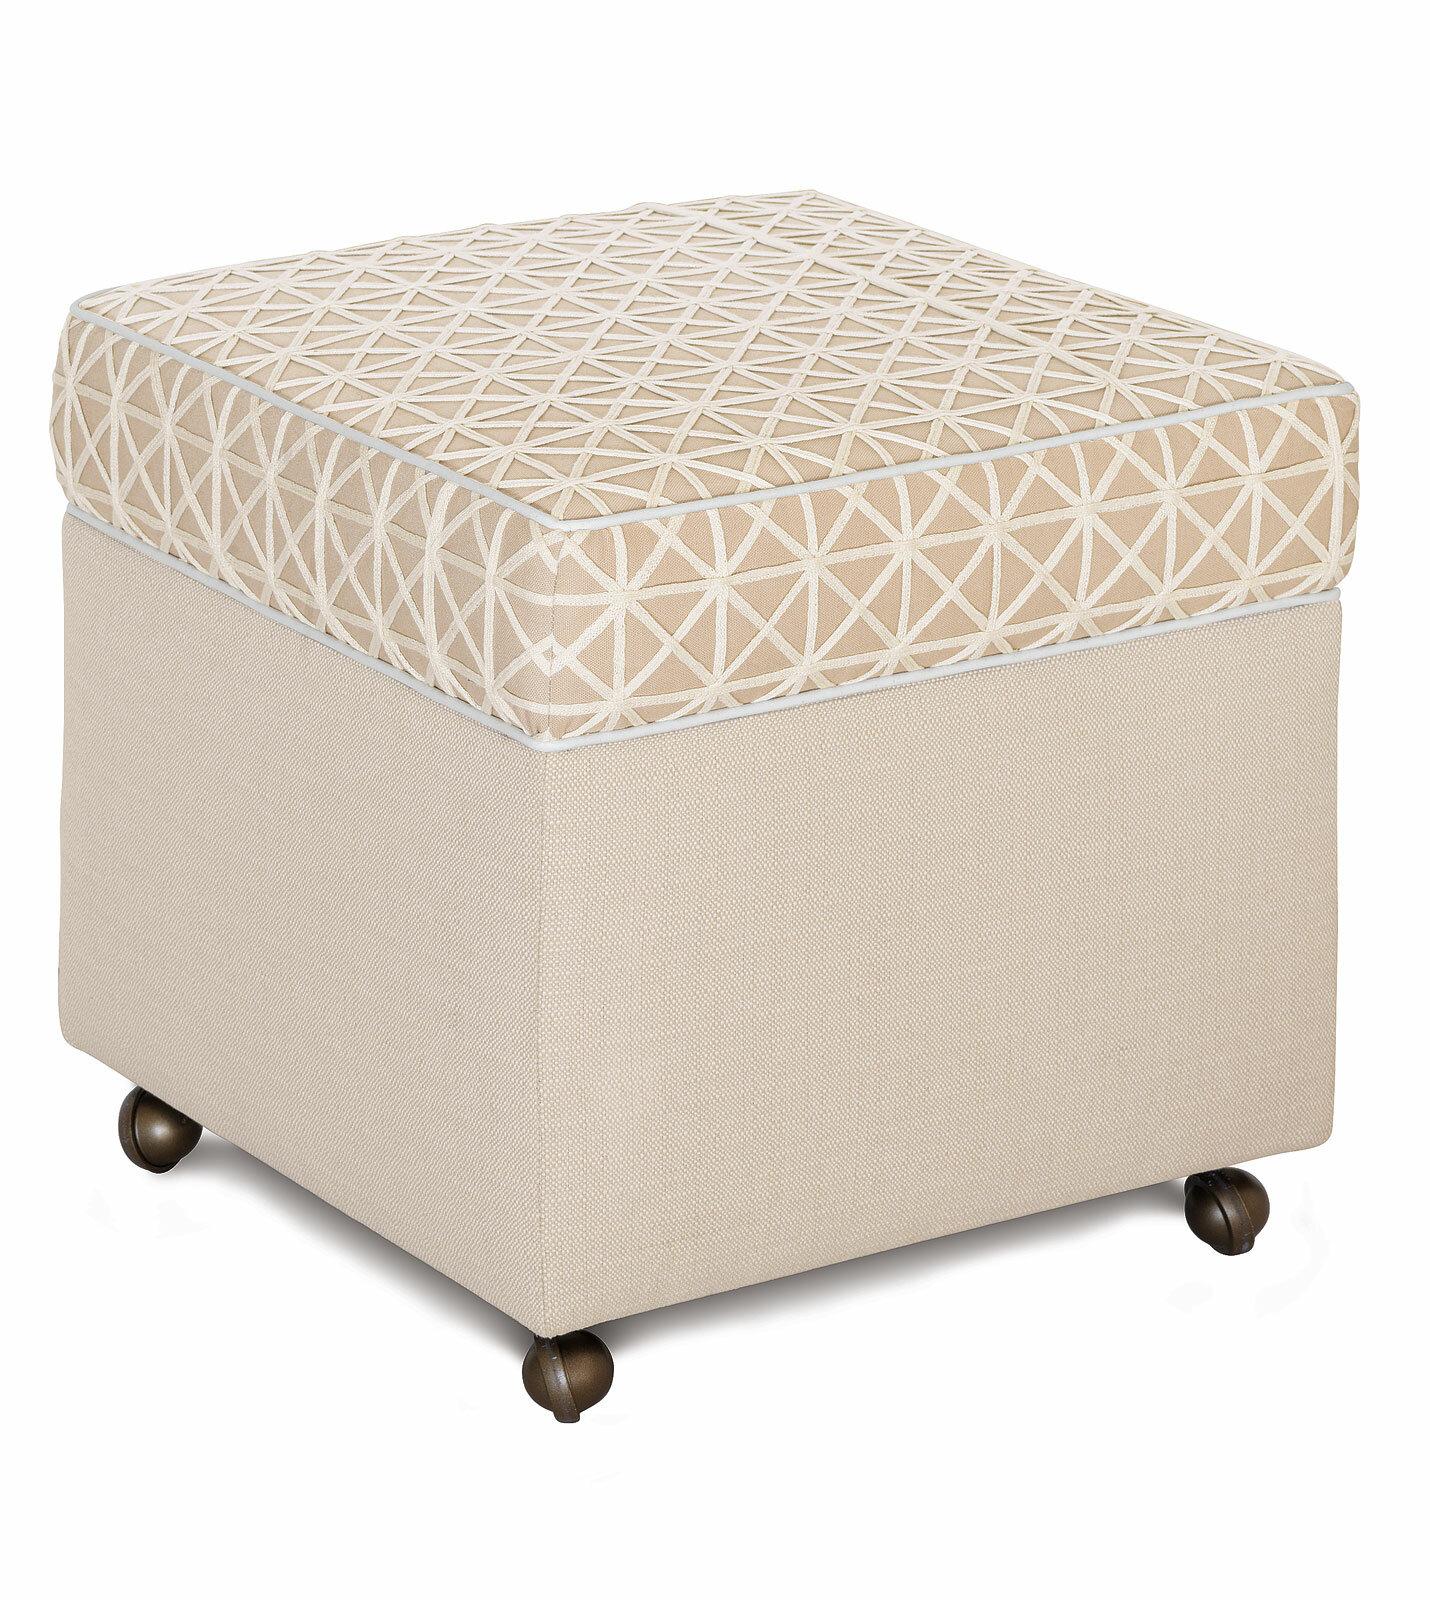 Eastern Accents Stelling Alchemilla Sand Storage Box Ottoman